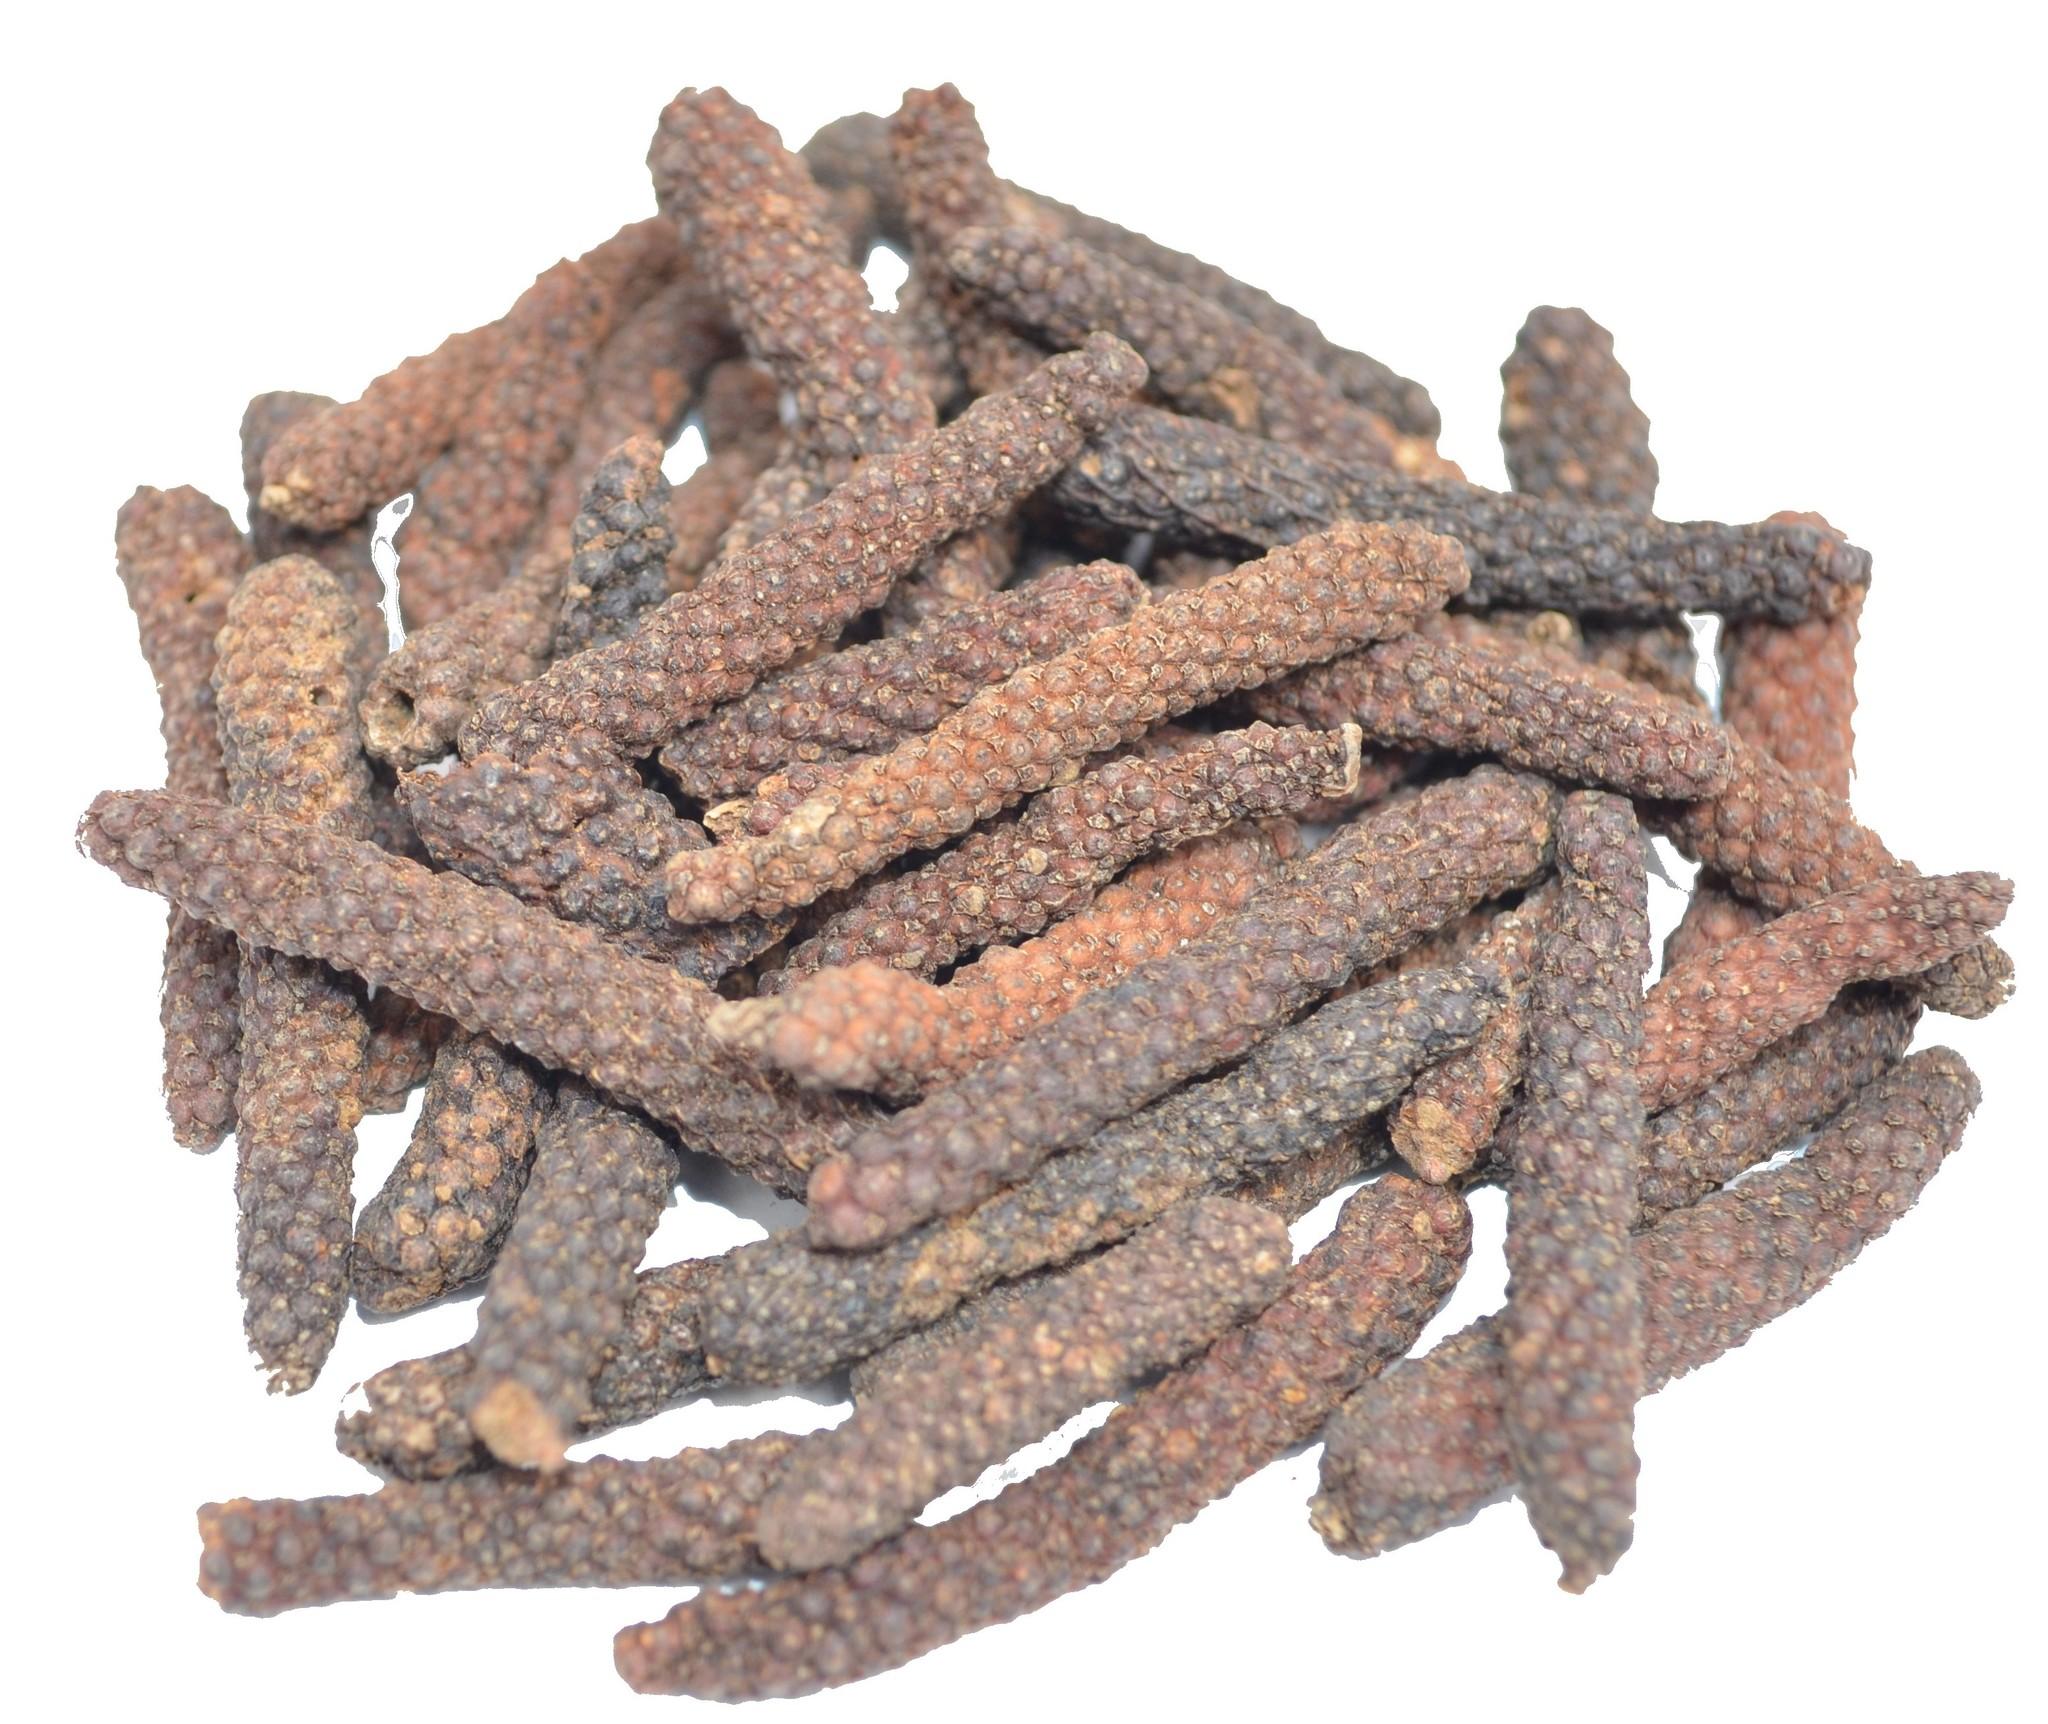 Peper zwart lang of Bengaalse peper